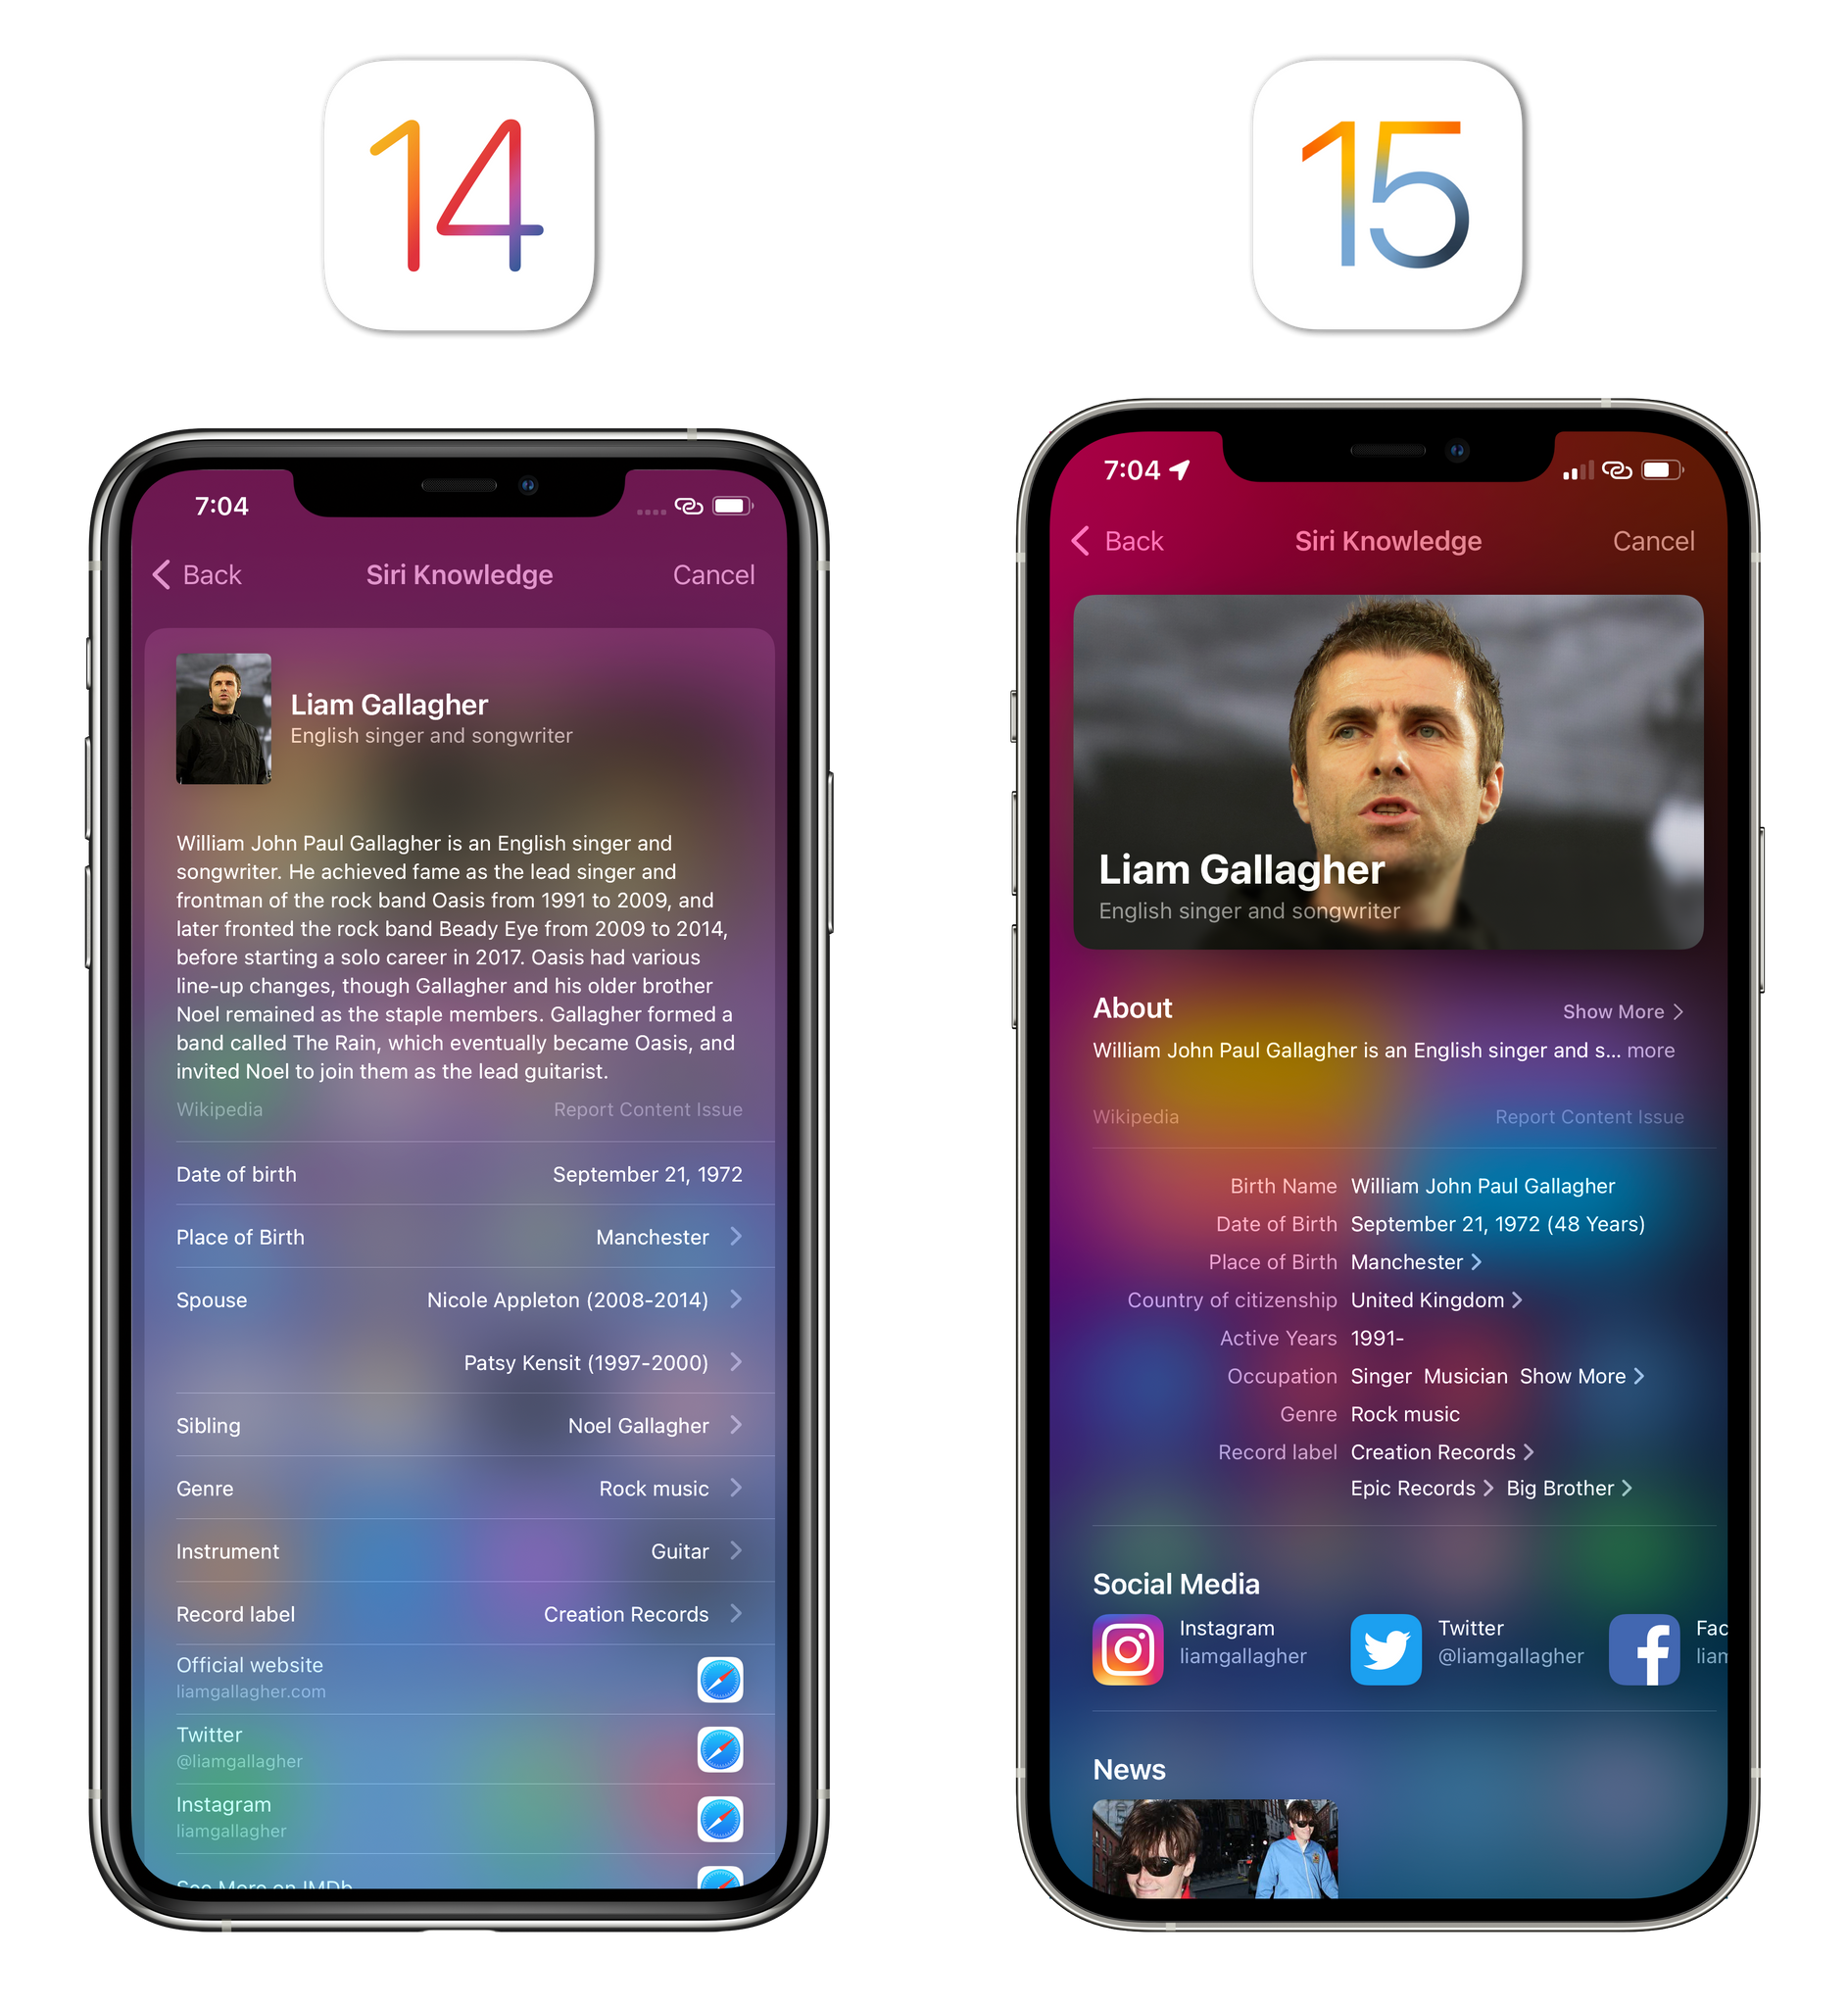 Richer Siri Knowledge results in iOS 15.